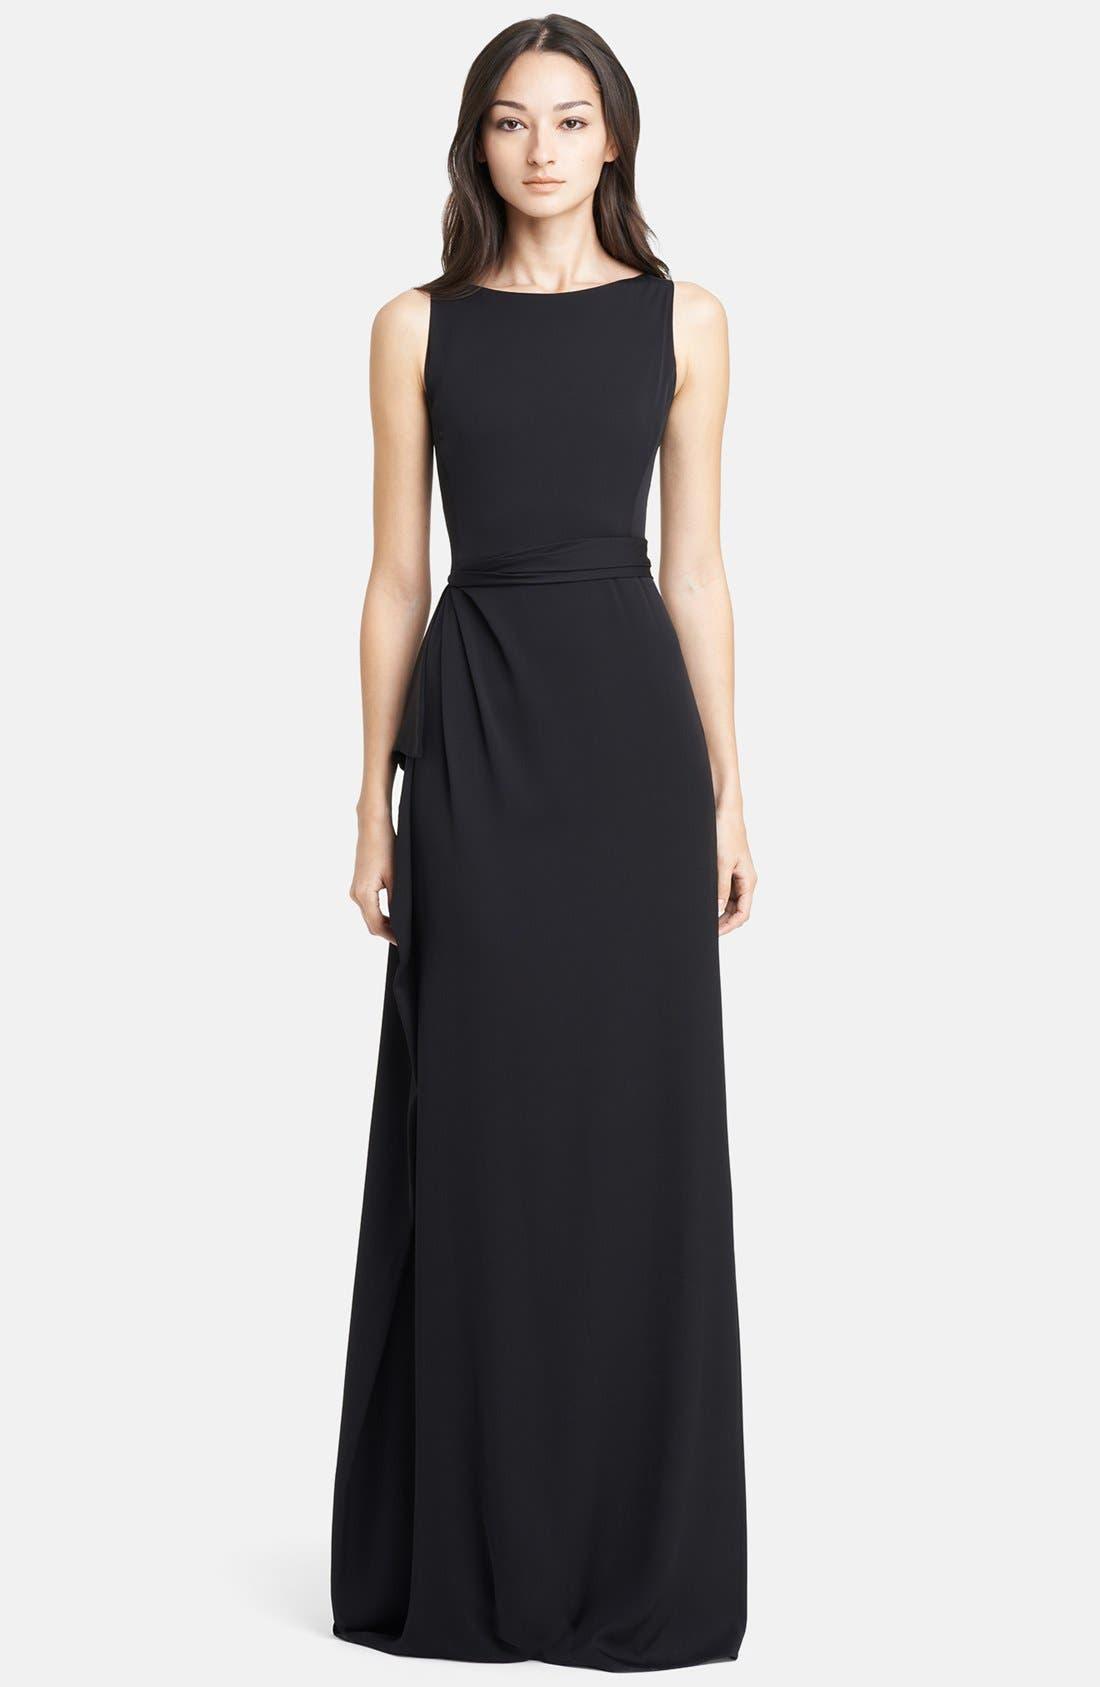 Alternate Image 1 Selected - Armani Collezioni Side Drape Cady Gown